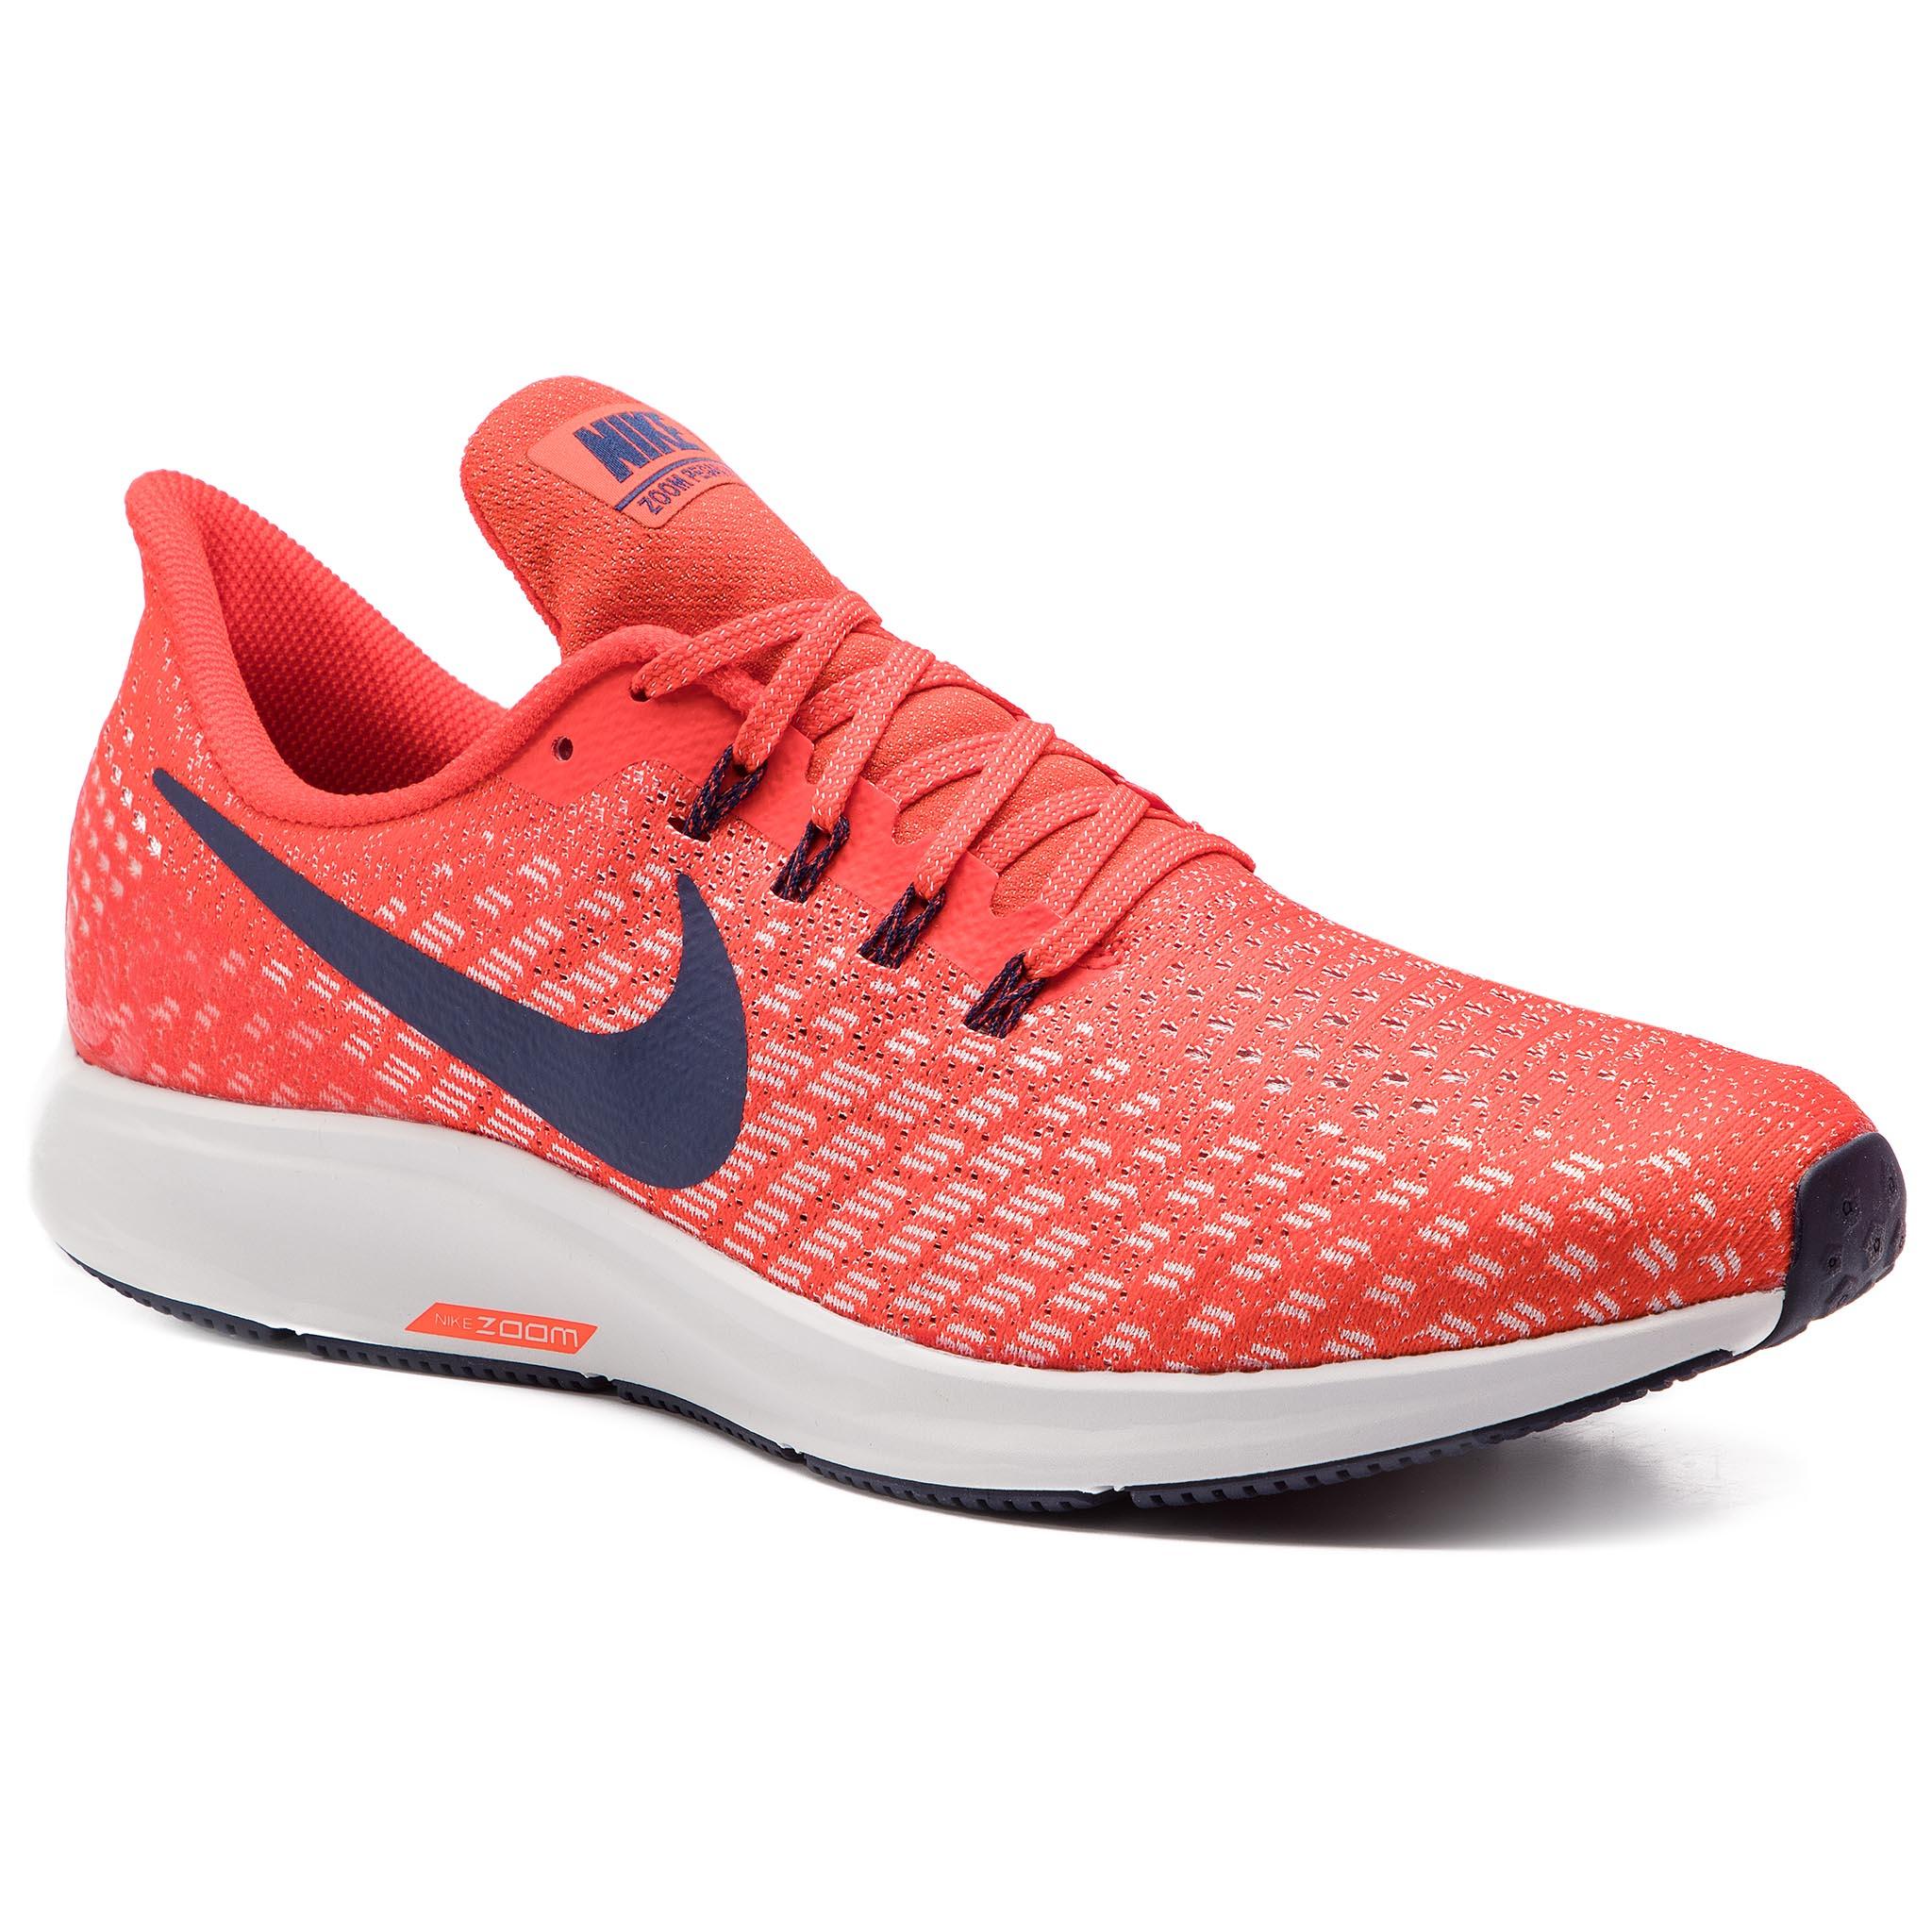 c90fc345aa5df Shoes NIKE - Air Zoom Pegasus 35 942851 008 Gridiron Laser Orange ...